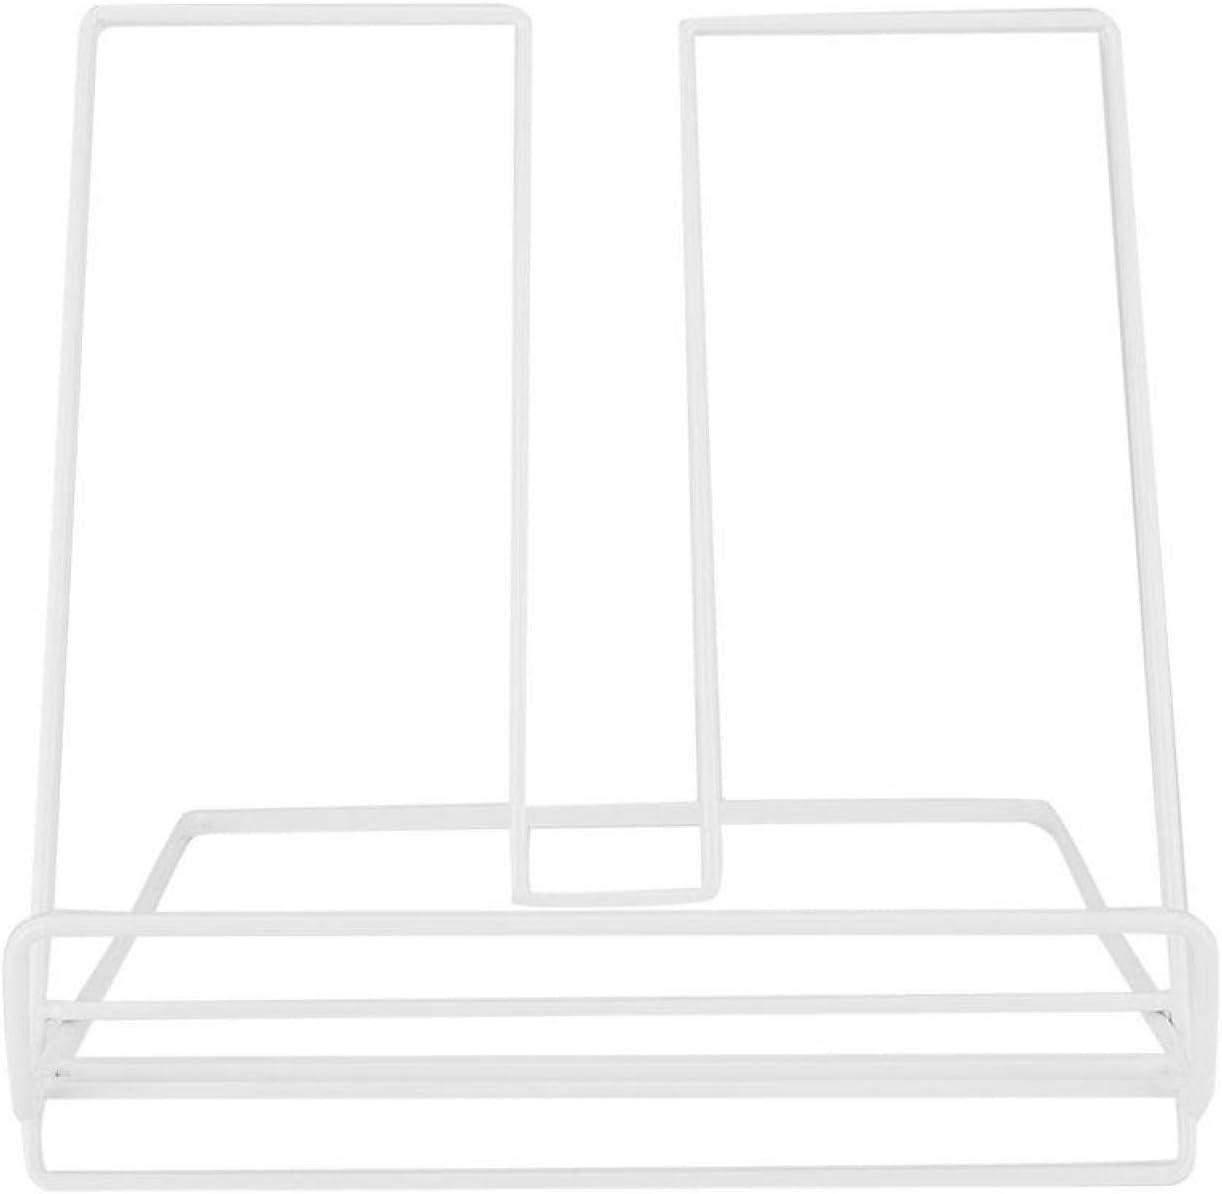 Book Holder,Iron Innovative Tabletop Book Shelf Rack Holder Tabl